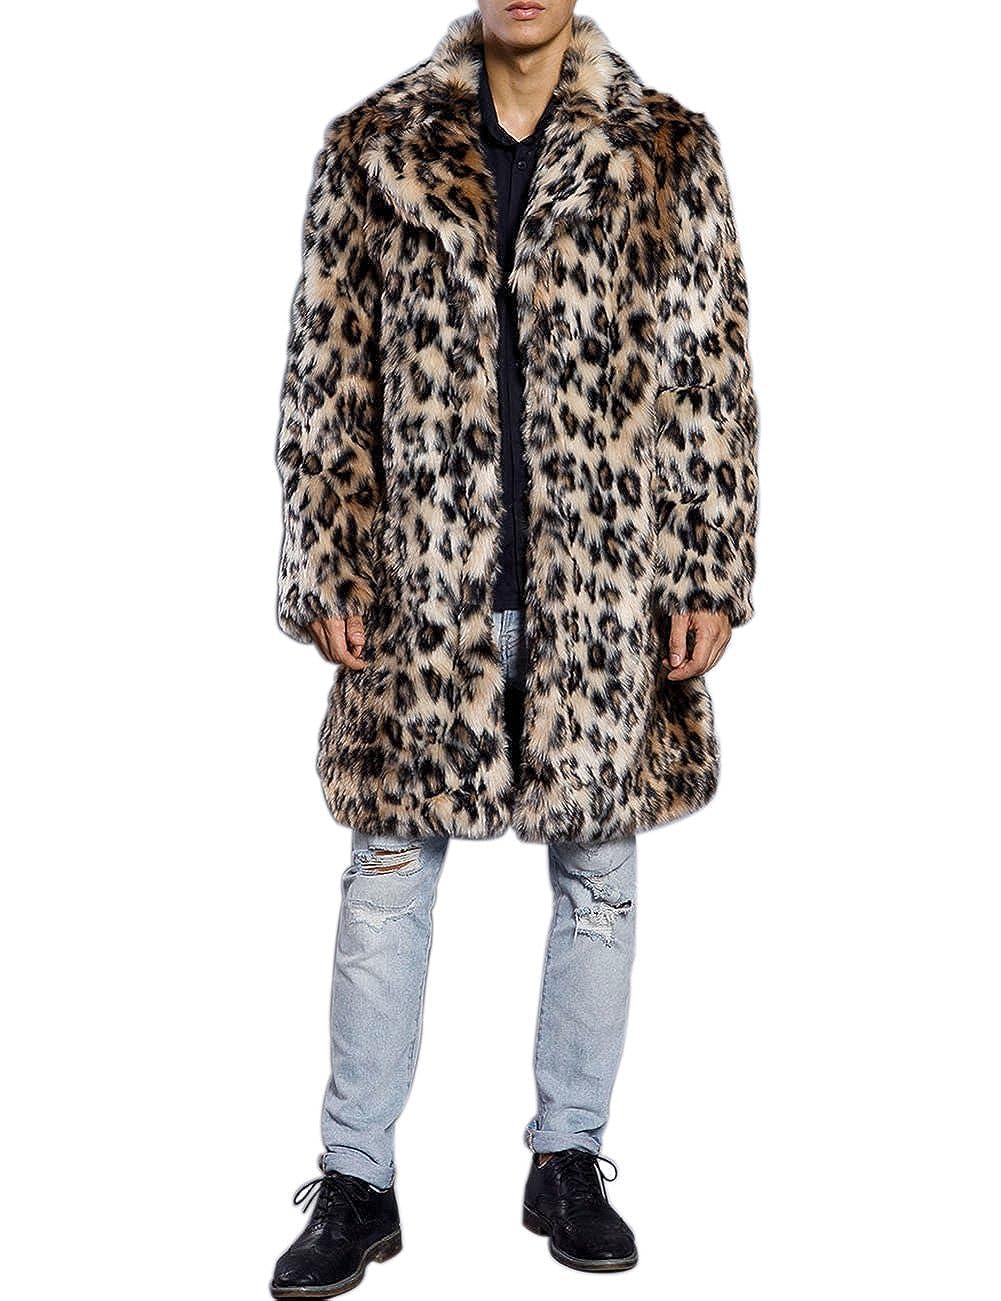 2b2bd30697f32 Top 10 wholesale Leopard Print Faux Fur - Chinabrands.com